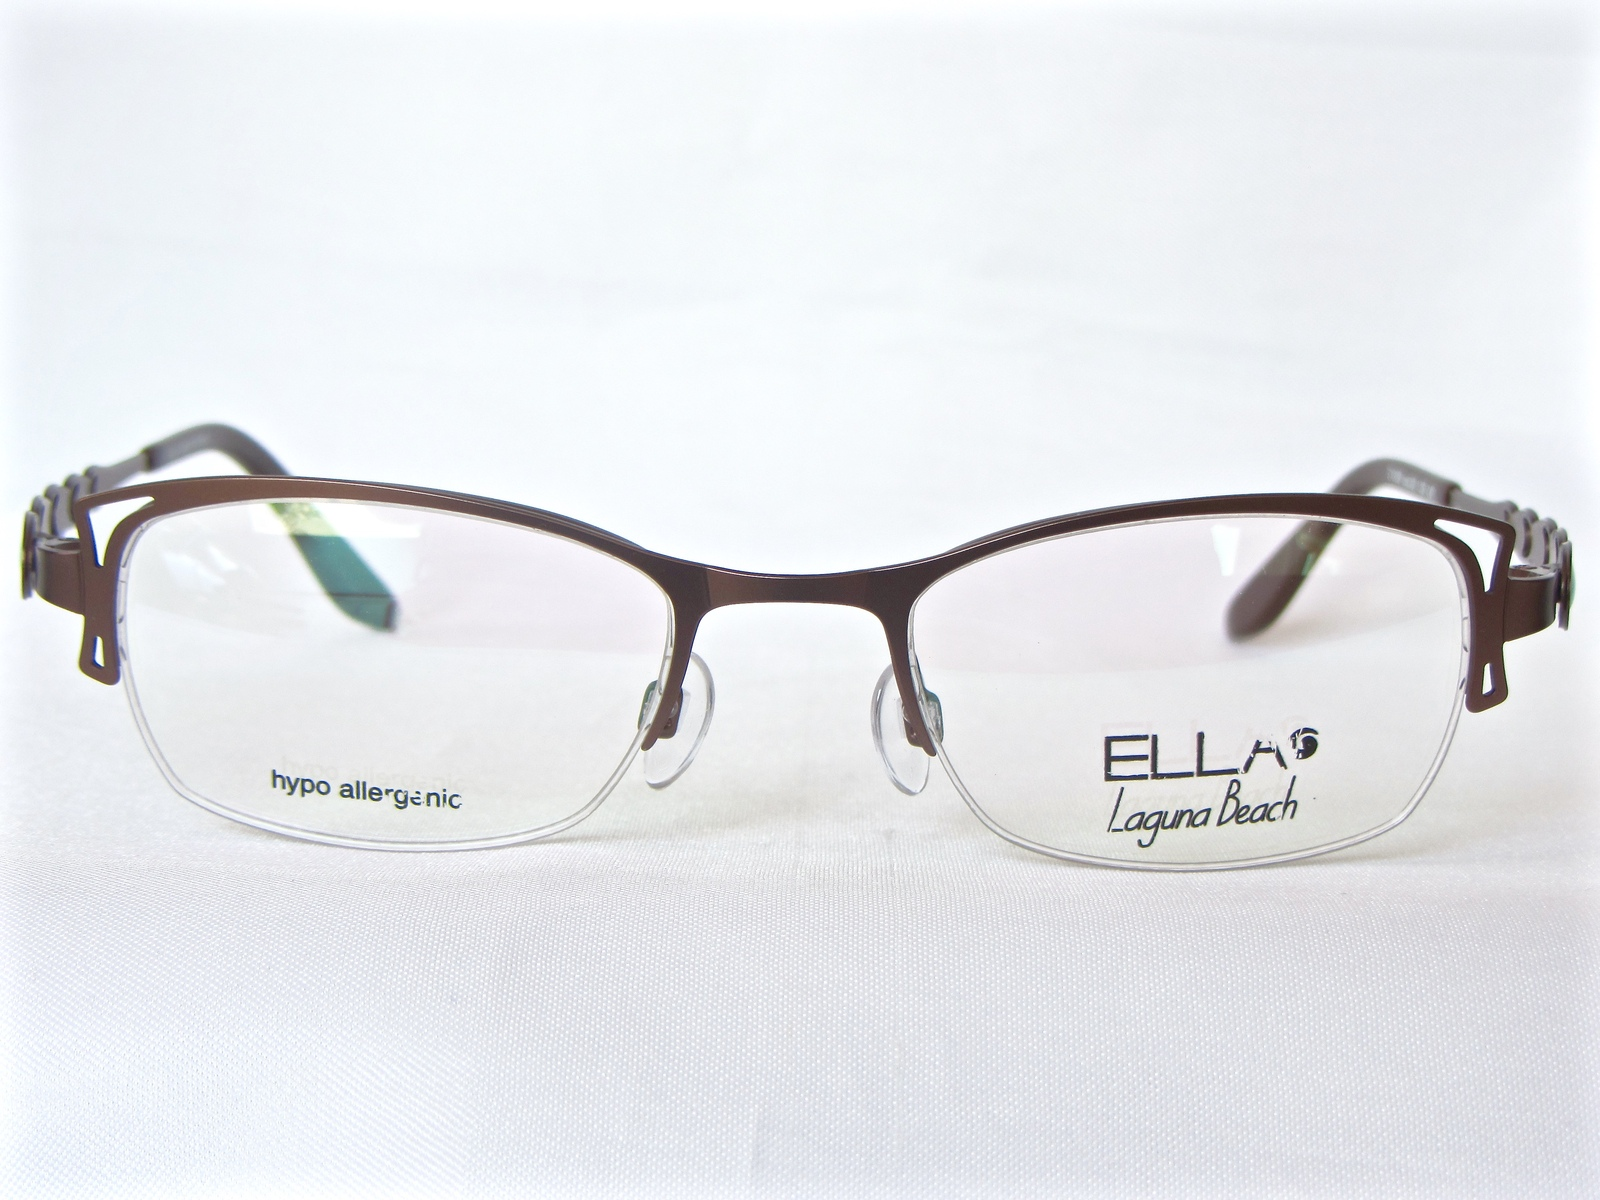 bcafac0cd22 ELLA Laguna Beach - 701009  eyeglasses